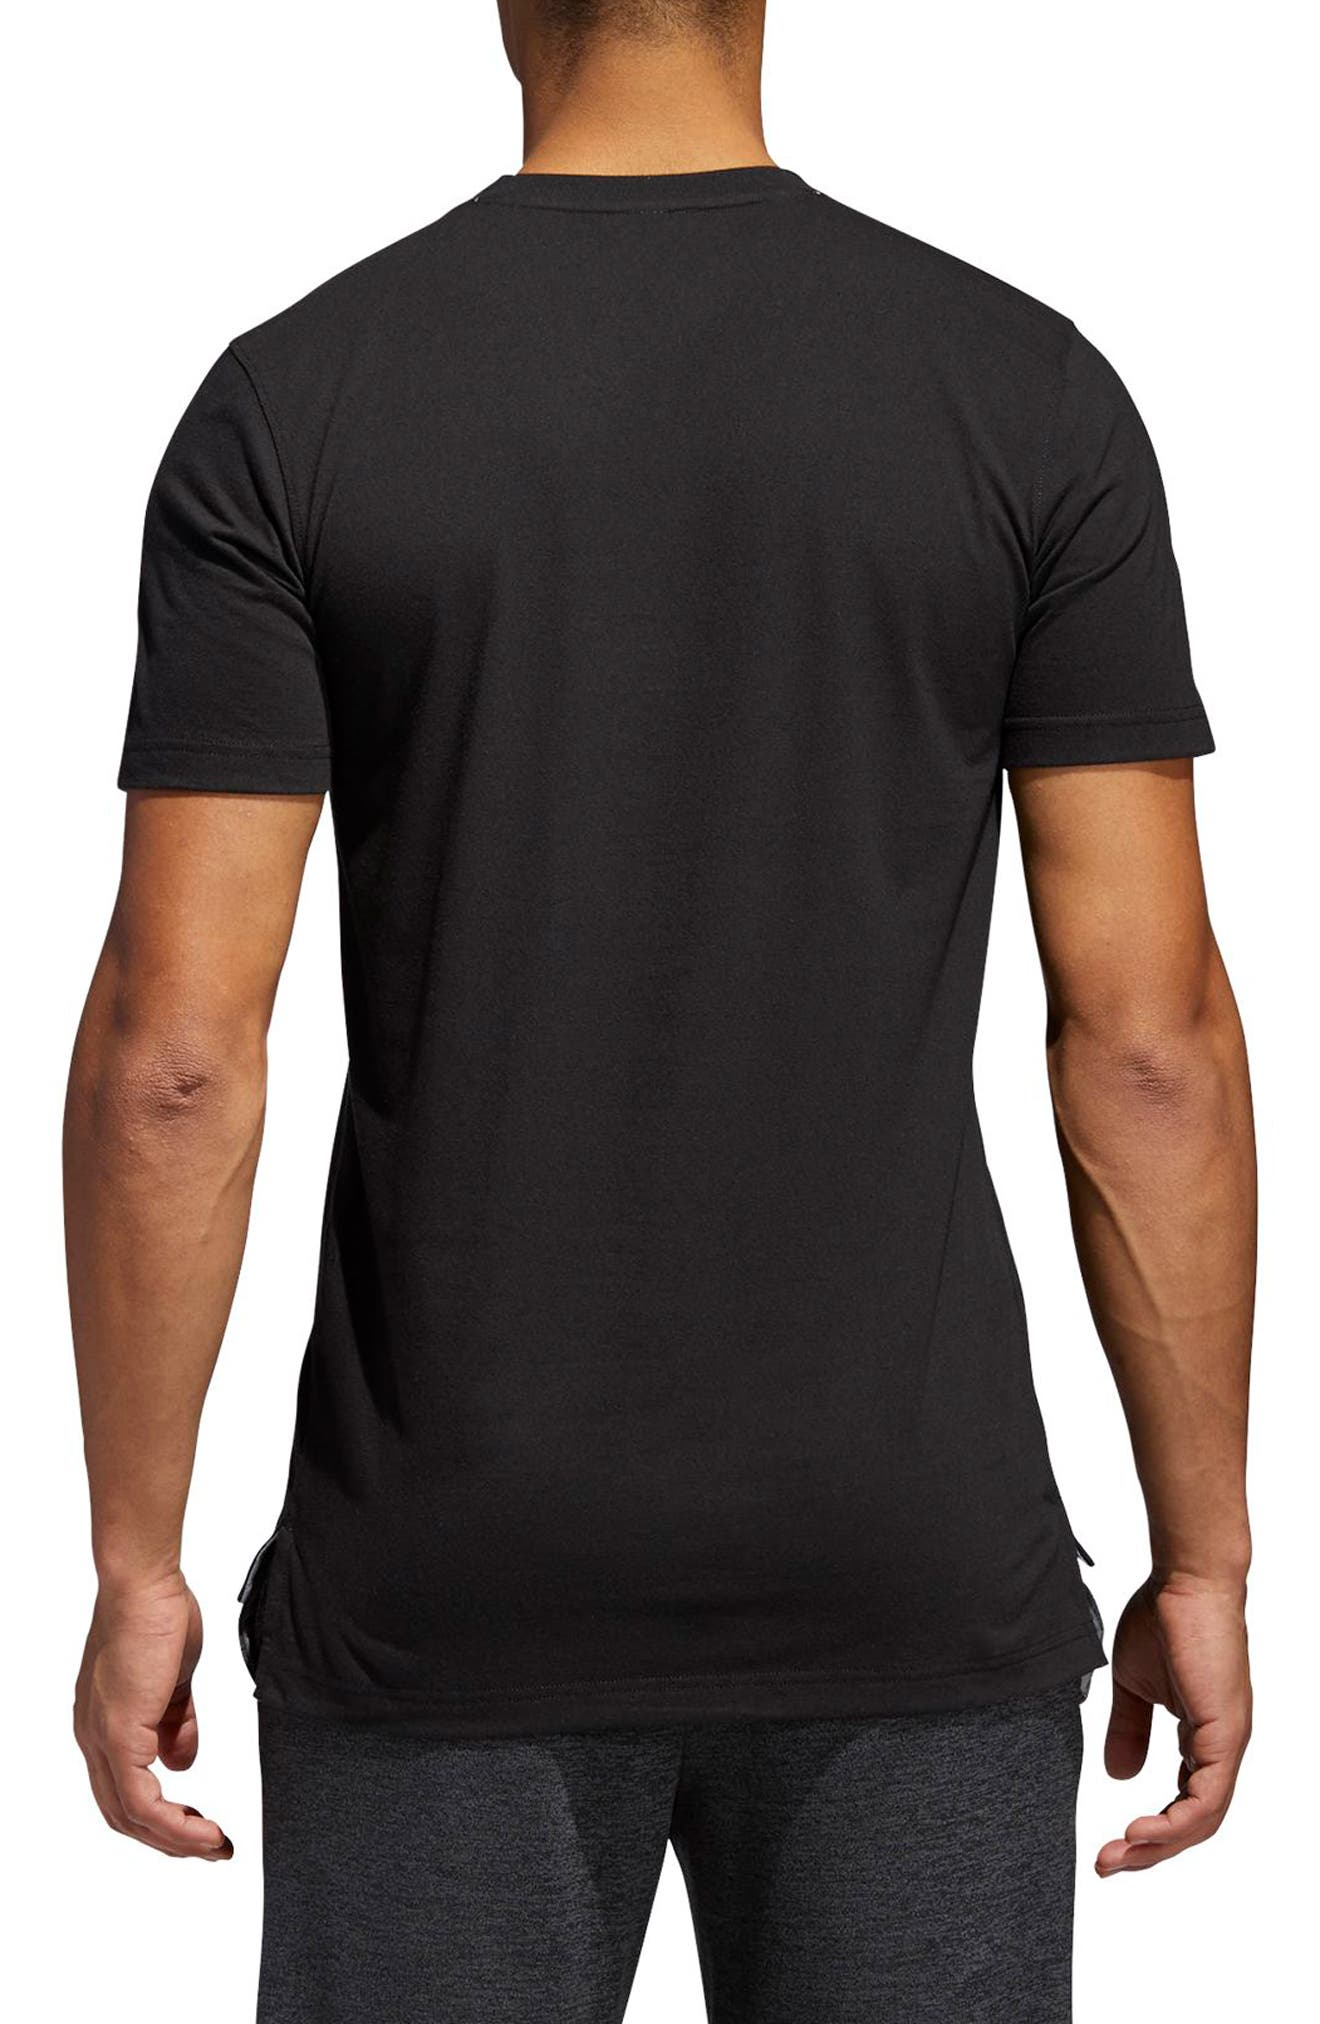 BOS Label T-Shirt,                             Alternate thumbnail 2, color,                             001